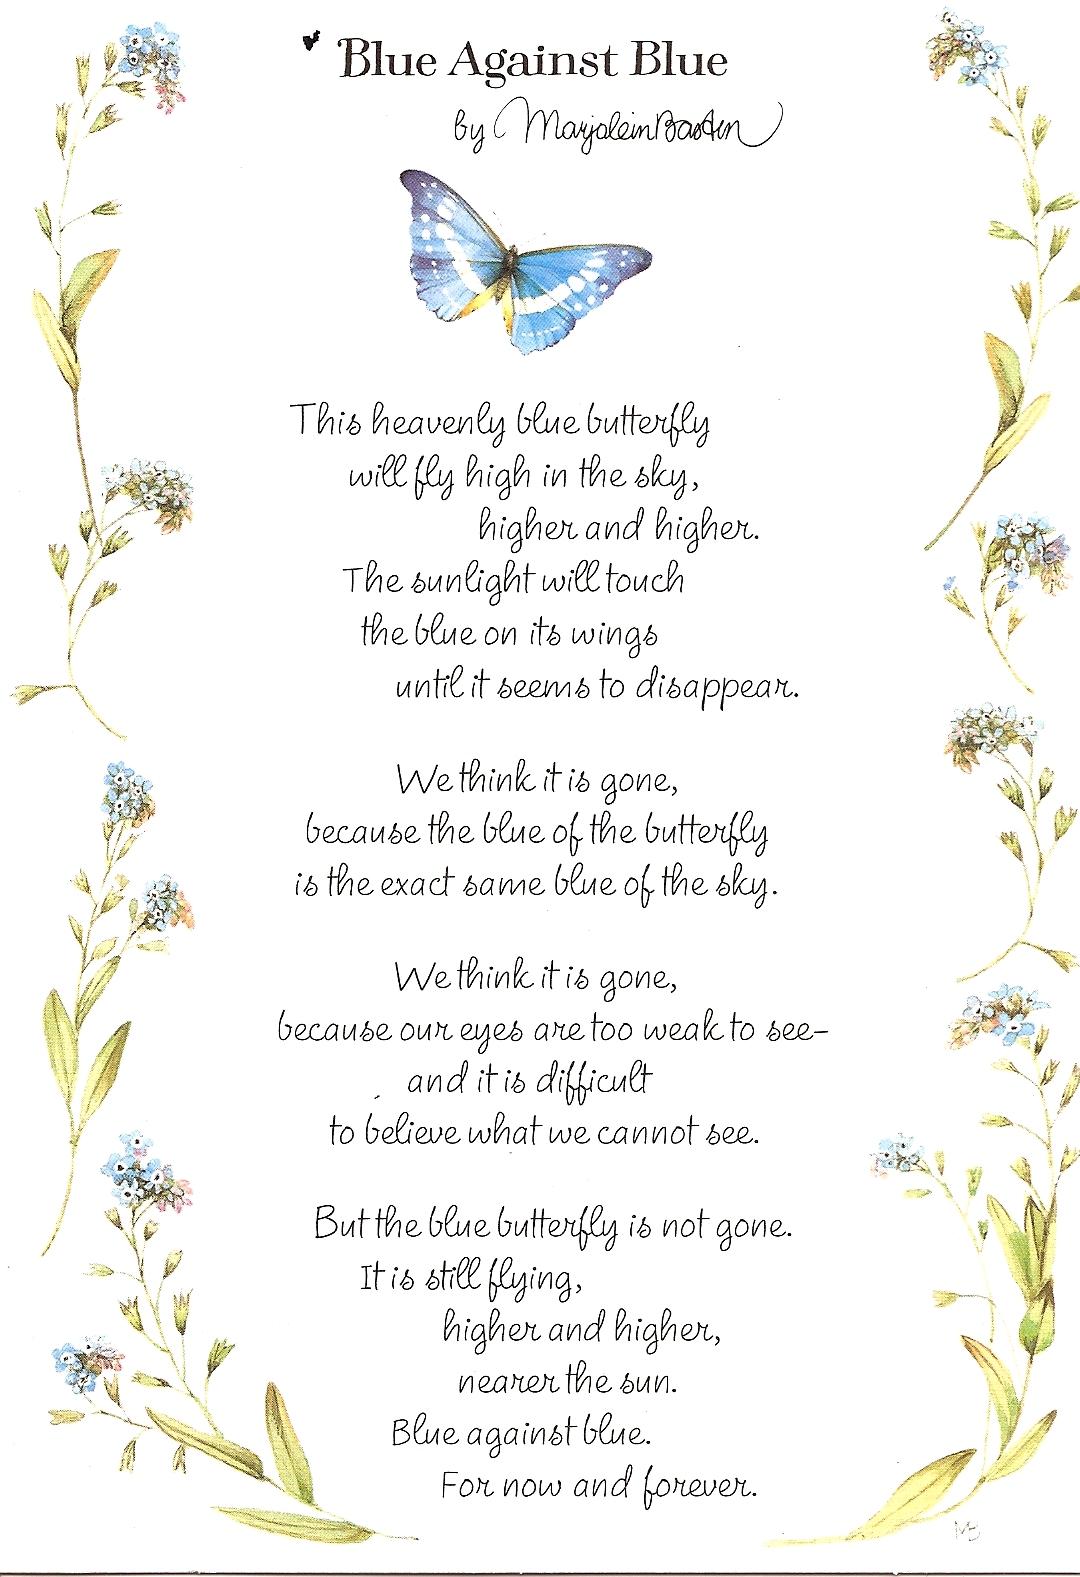 http://2.bp.blogspot.com/_r68tnyTMUZ8/TUtijvLpf8I/AAAAAAAAAPo/ns4FXfm4m84/s1600/Blue+Butterfly.jpg